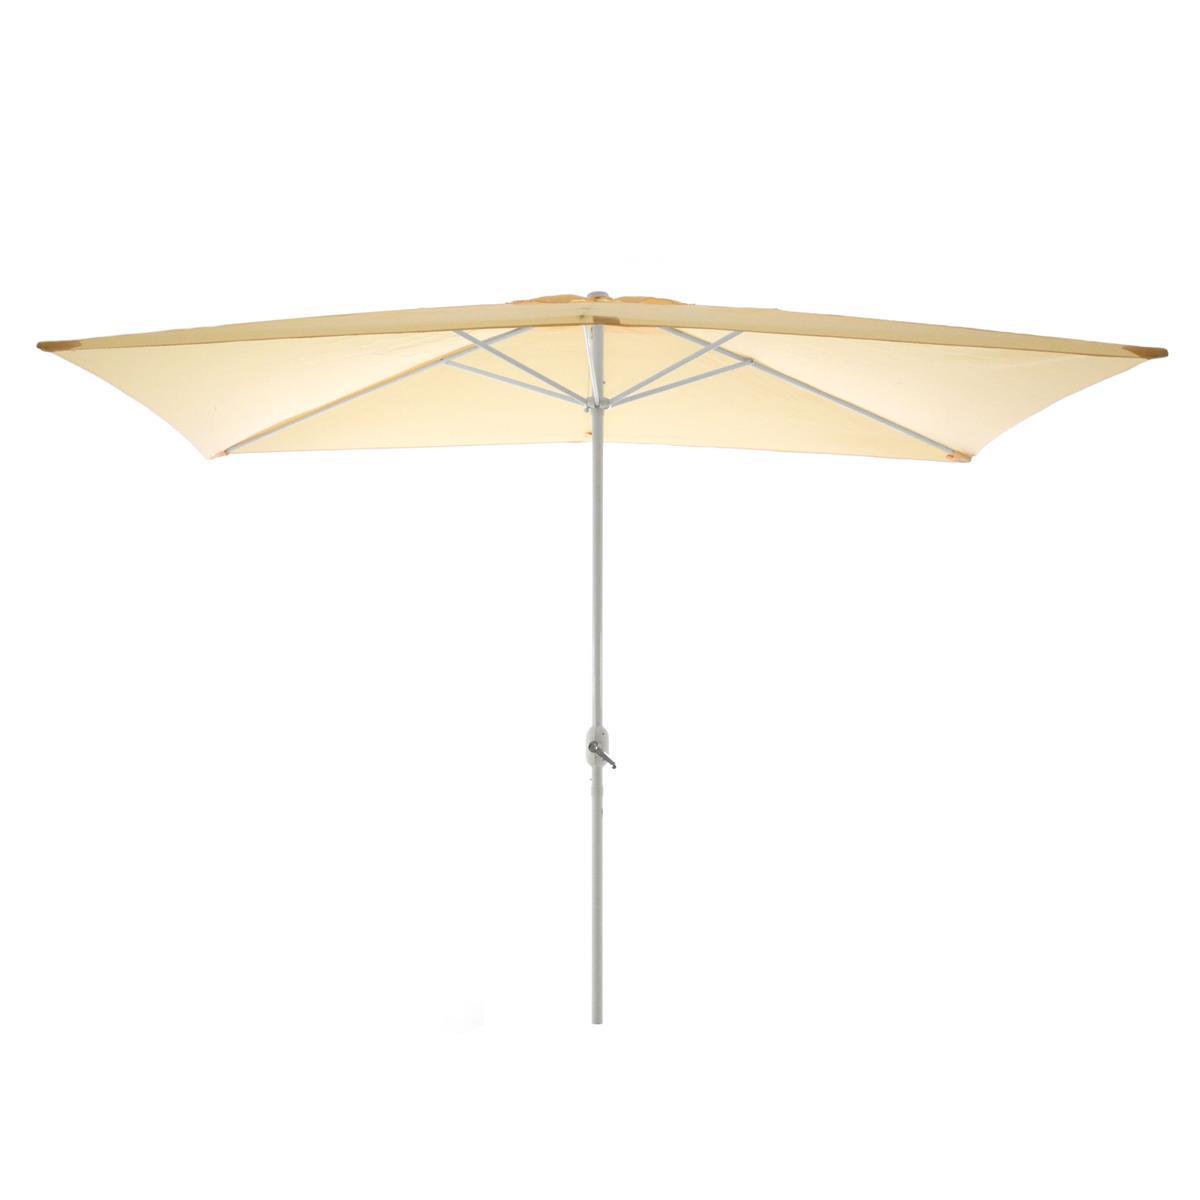 Sonnenschirm eckig 2x3m beige Kurbel Marktschirm Rechteckschirm Sonnenschutz